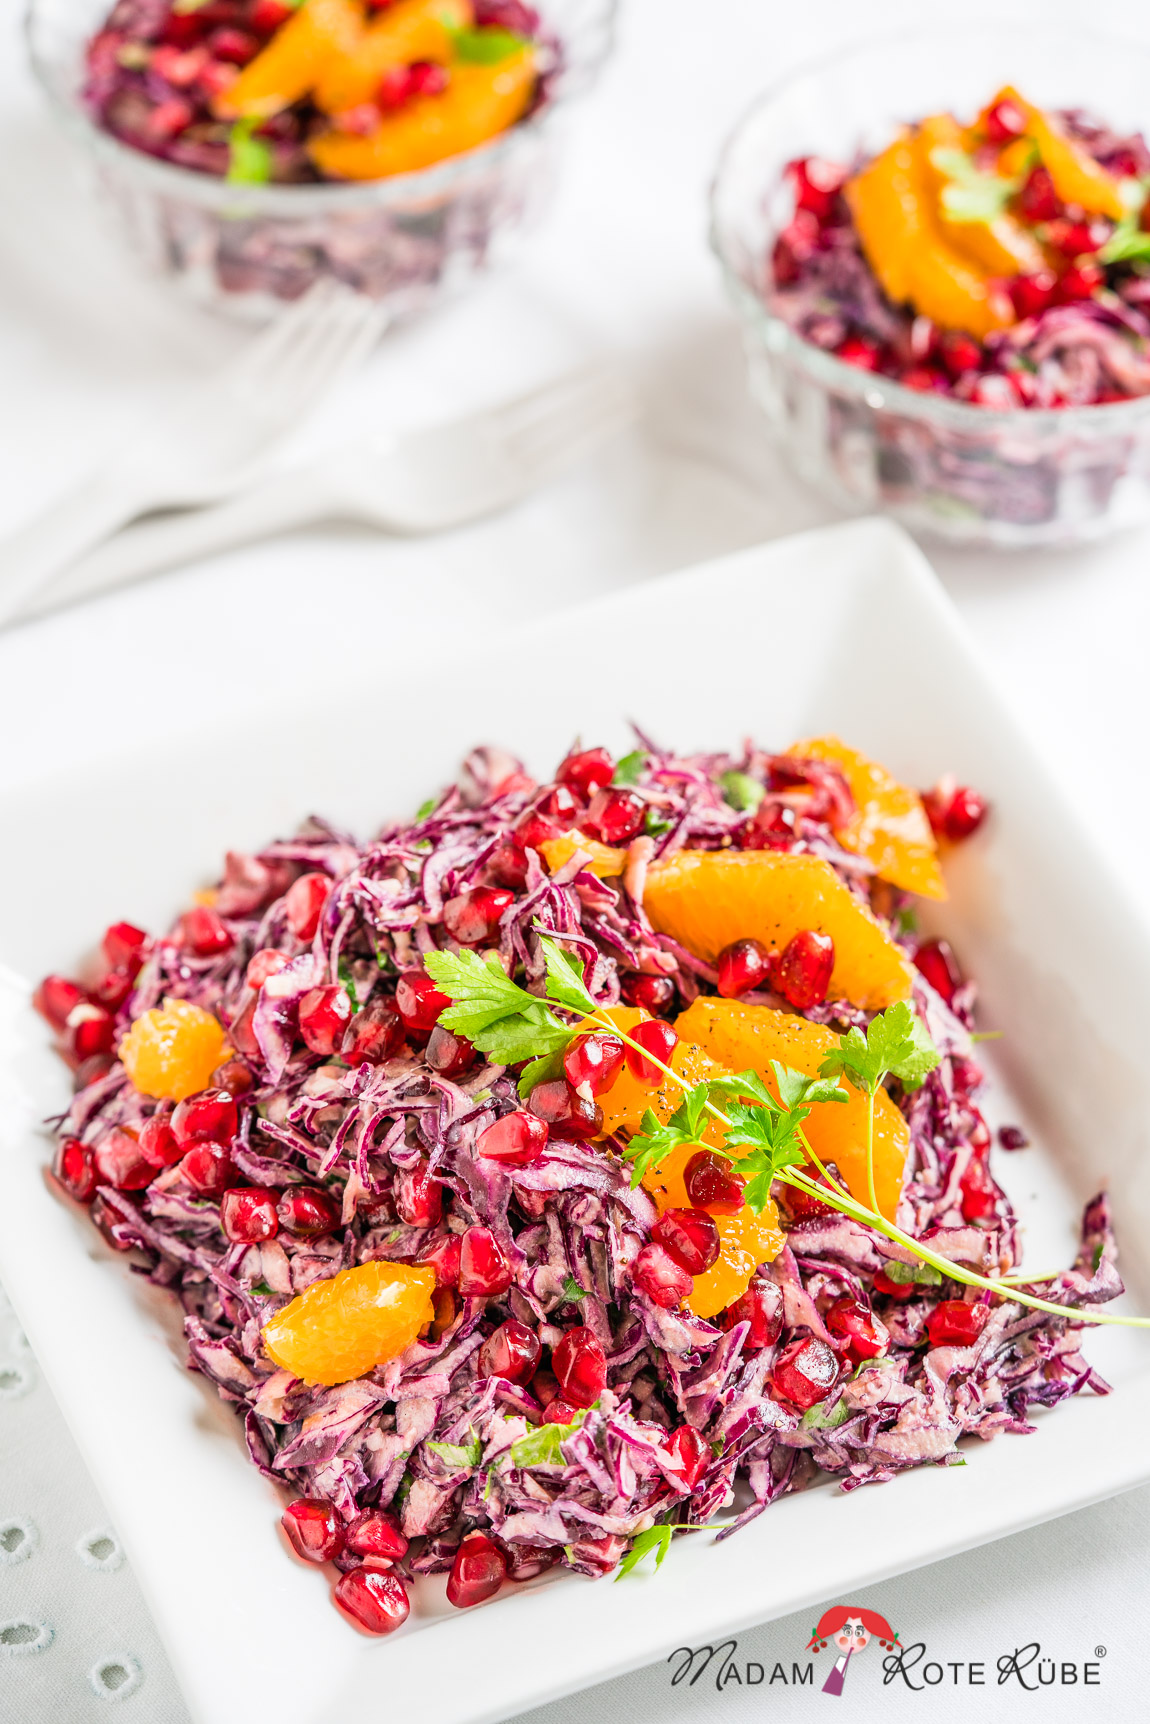 Madam Rote Rübe - Rotkohl-Salat mit Granatapfel und Lemon-Tahini-Dressing